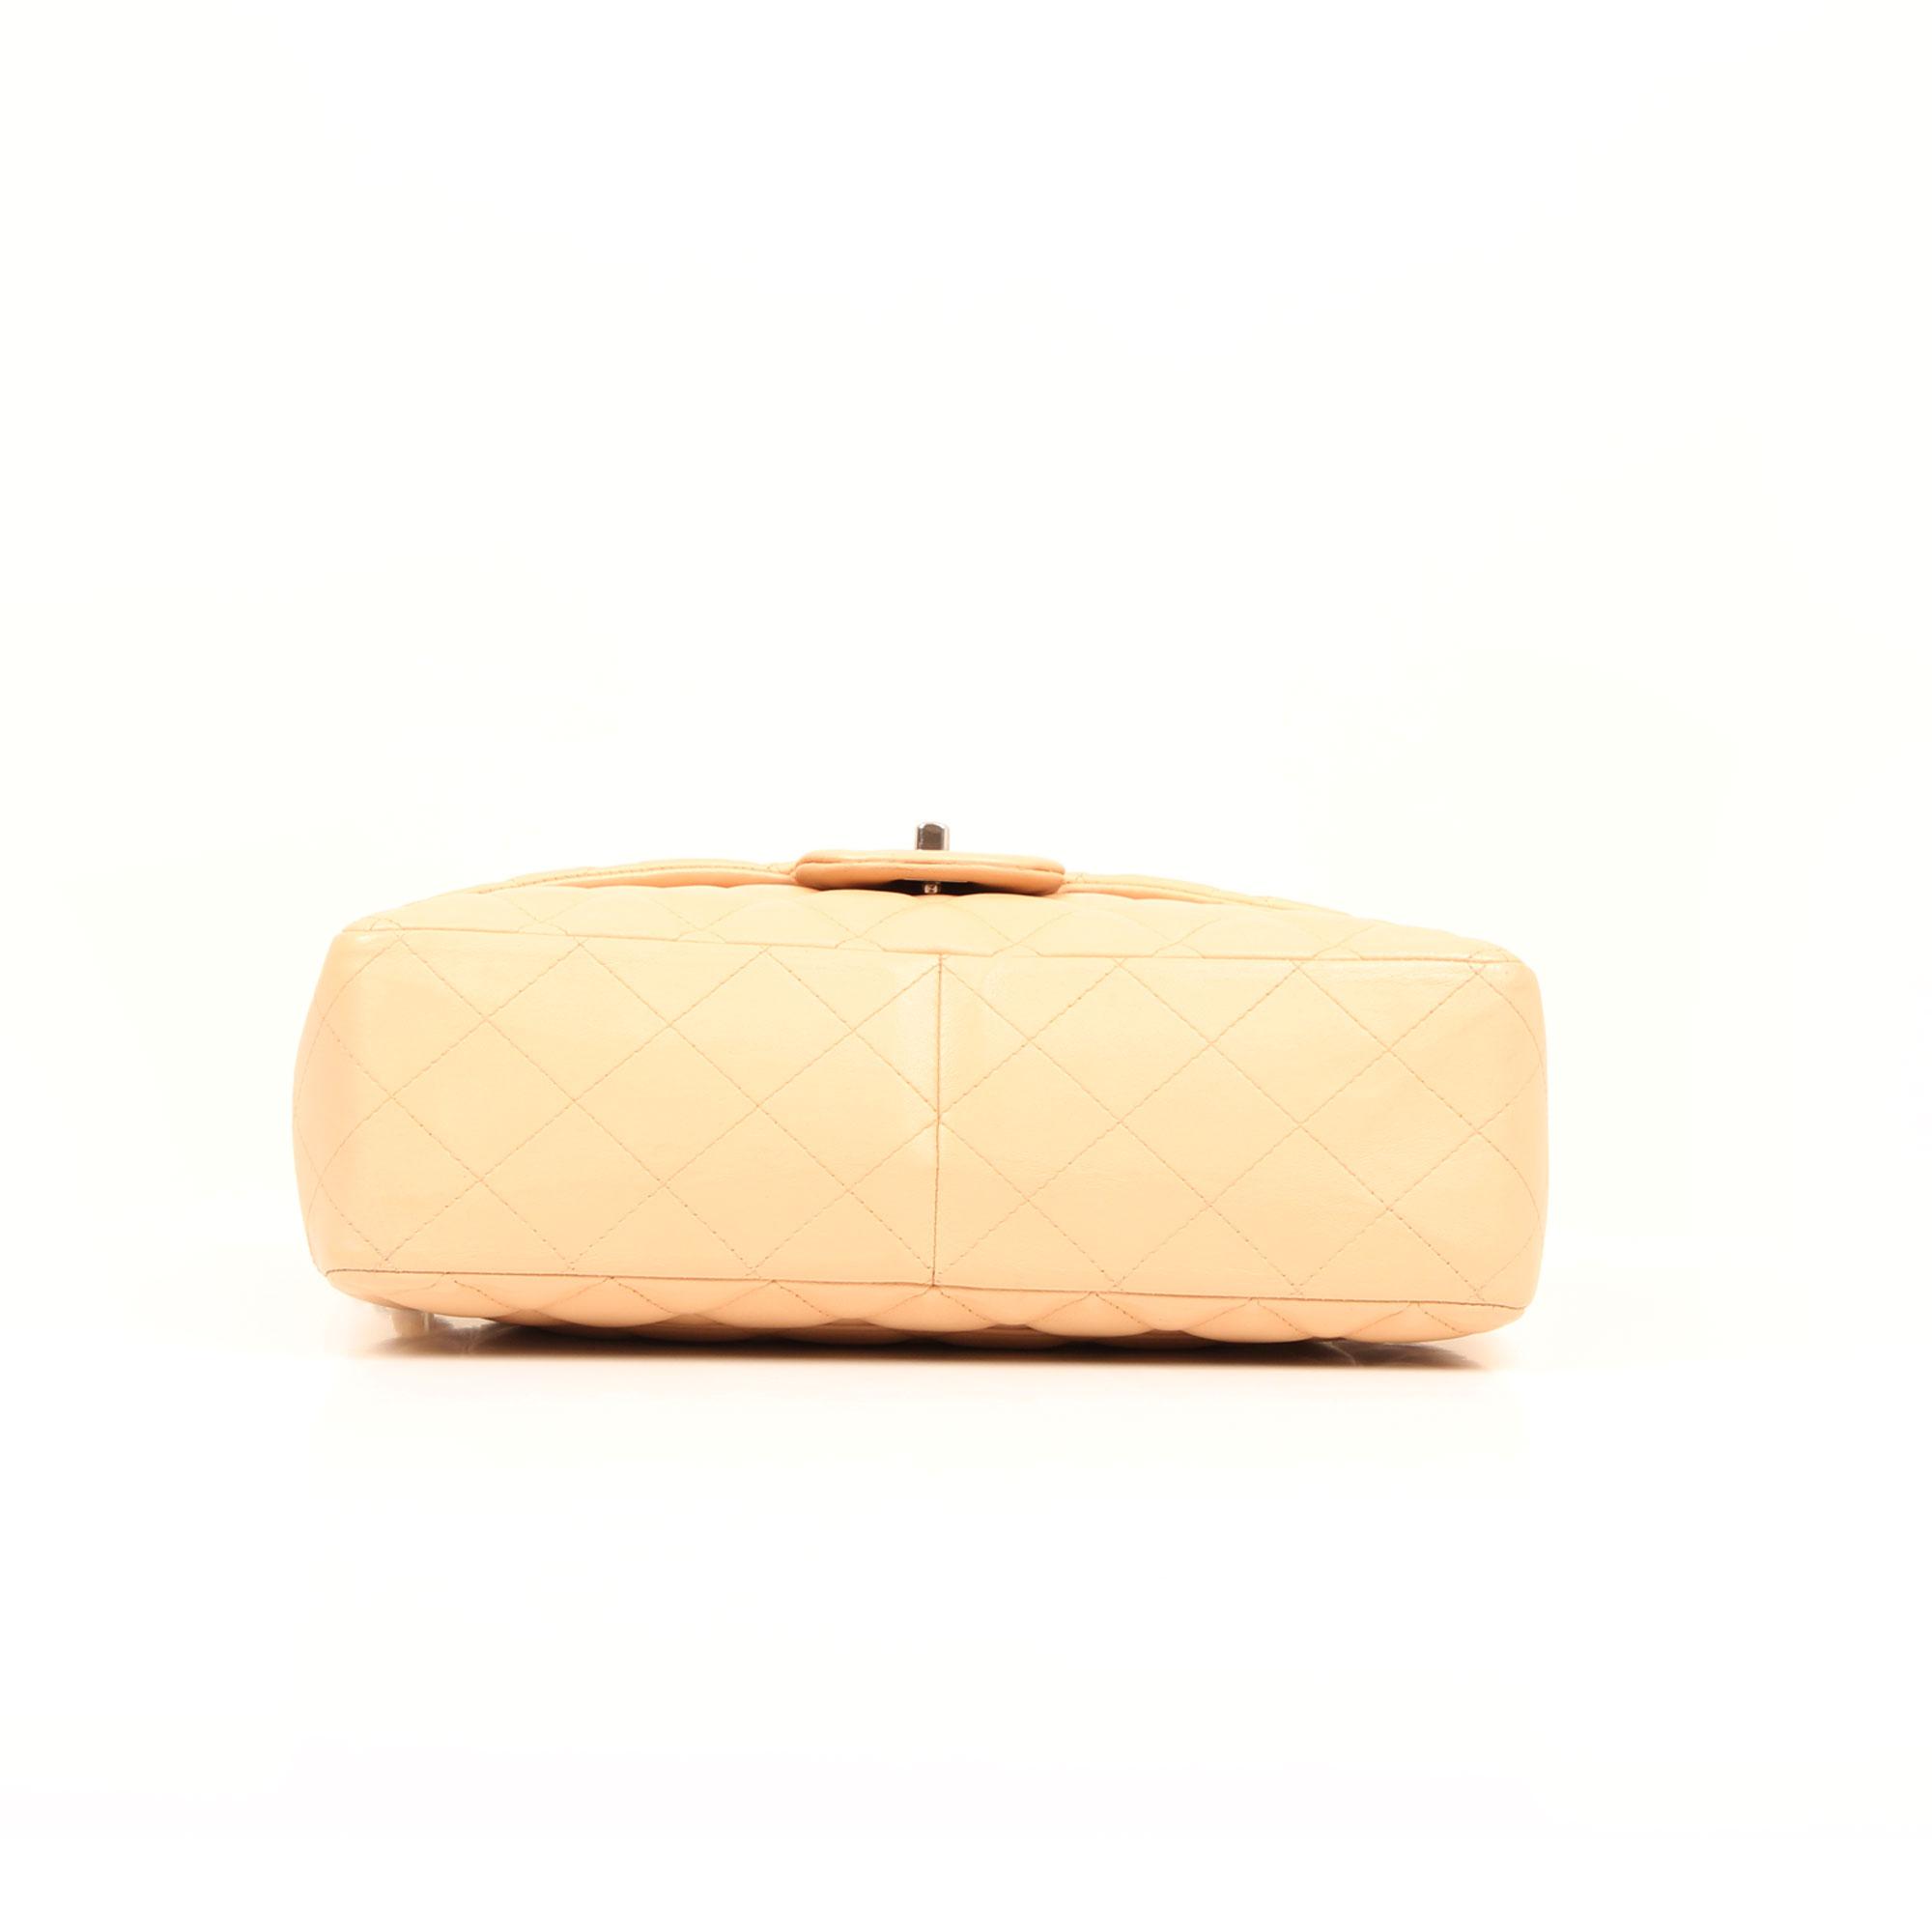 Imagen de la base del bolso chanel jumbo classic beige cordero